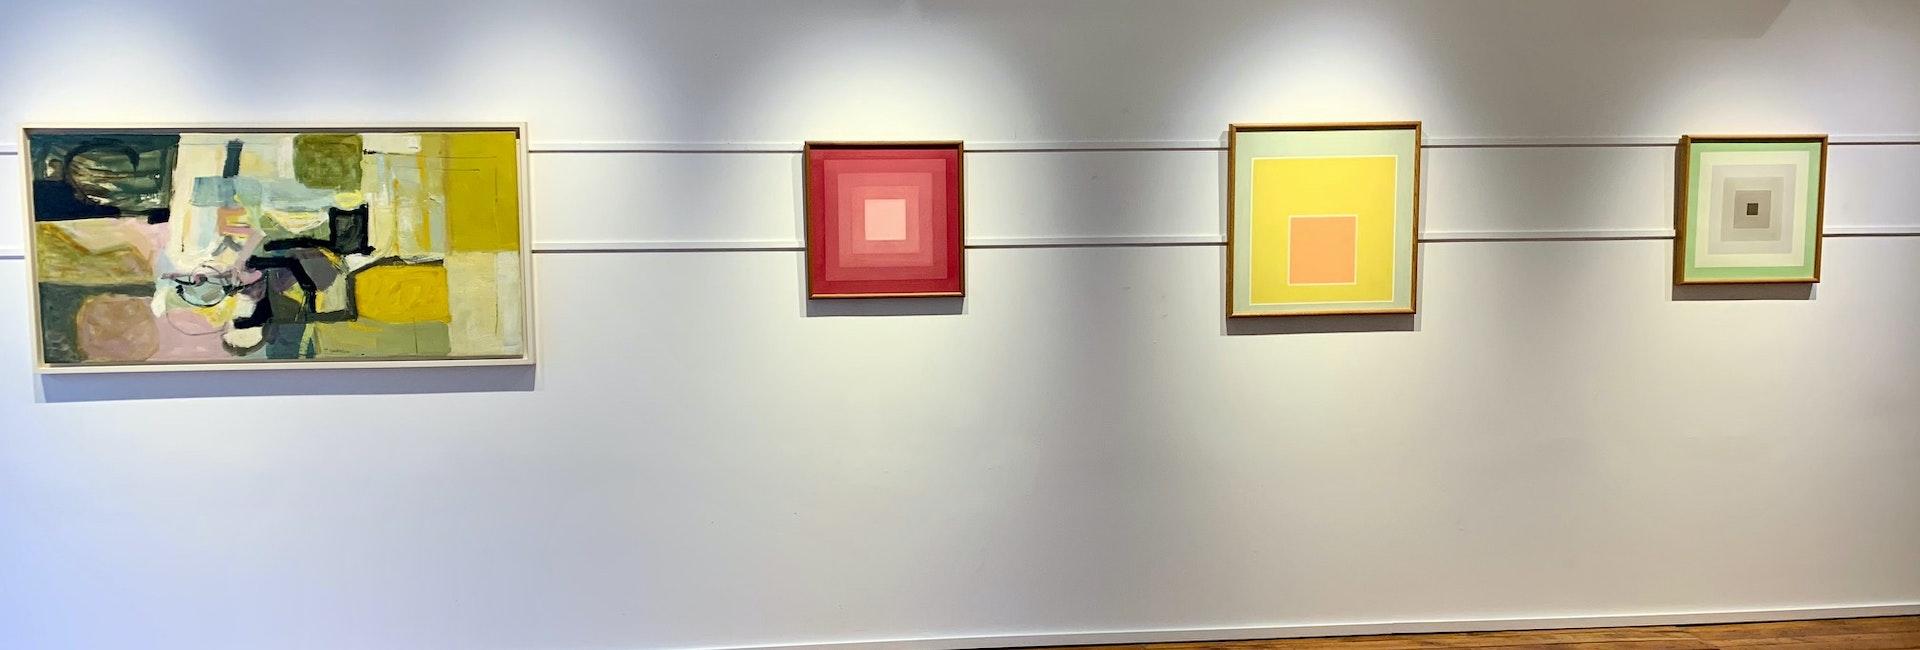 Art Gallery, Art, Flooring, Floor, Wood